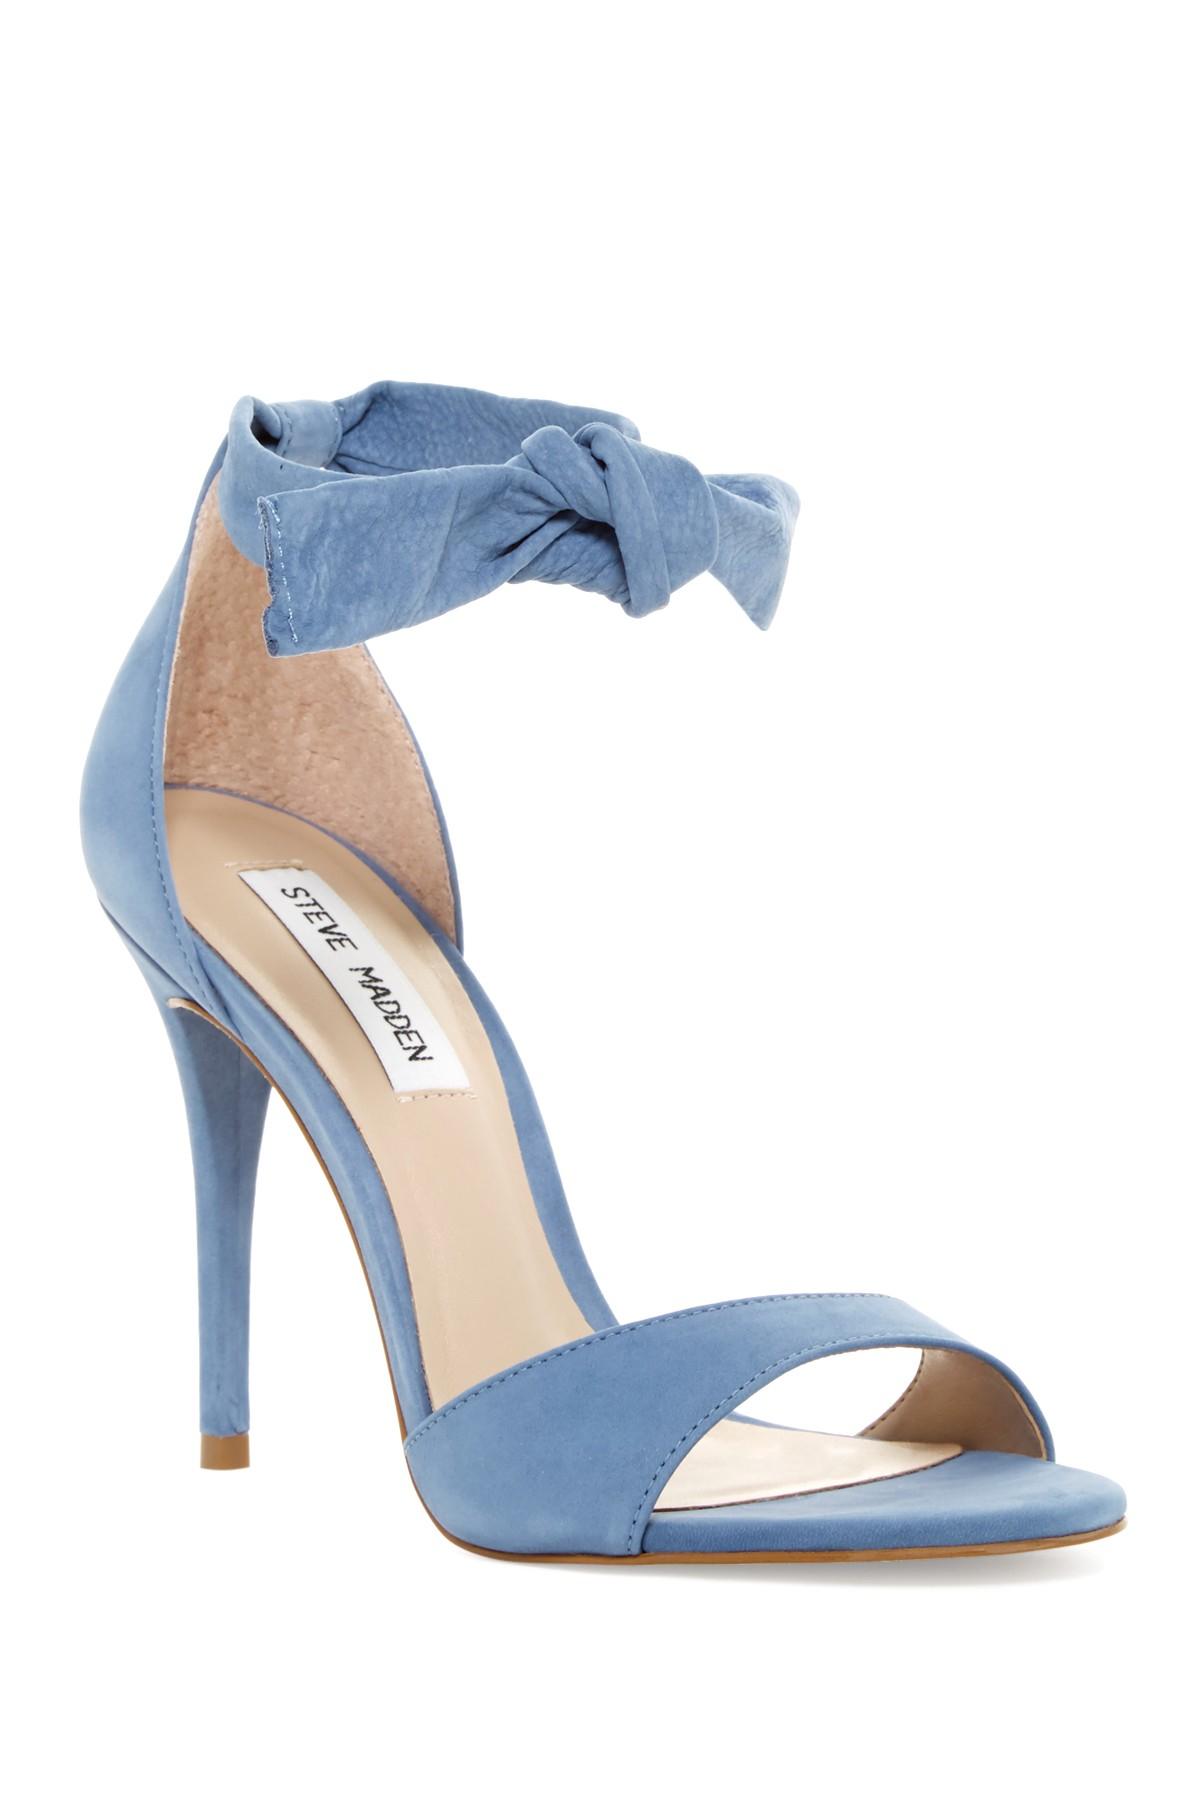 7df9aef1394 Lyst - Steve Madden Bowwtye Heel Sandal in Blue